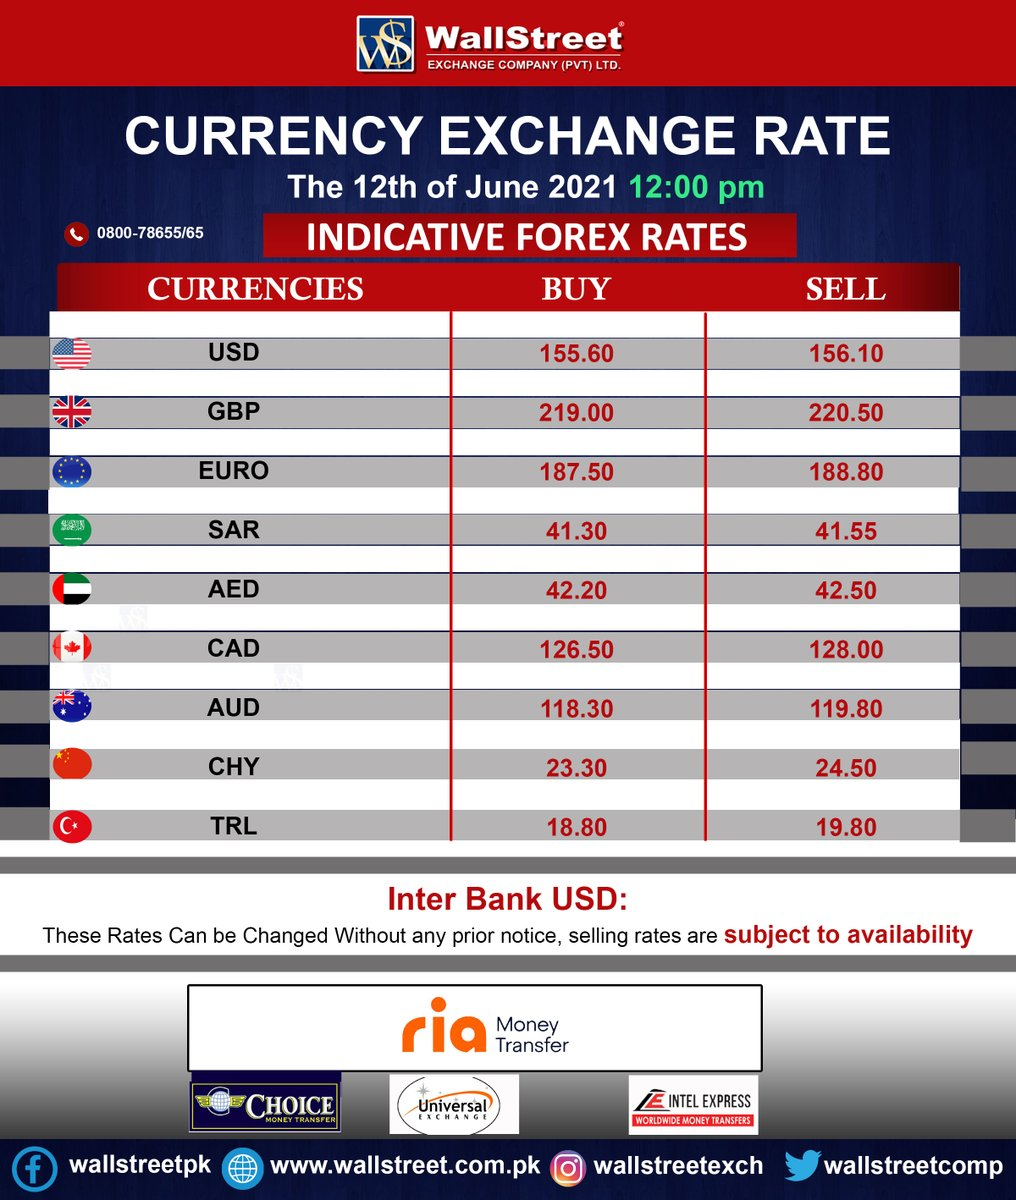 WallStreet Exchange Company Pvt. Ltd. Exchange Rates 12 June. 2021 #WallStreet  #Money #Dollar #MoneyExchange #OverseasPakistani #Pakistan #CurrencyExchange #MoneyTransfer #ForeignExchange #CurrencyRate #Dollarrate #Currencytrader #Moneytrader #moneymaster https://t.co/Jn77b4dKoZ